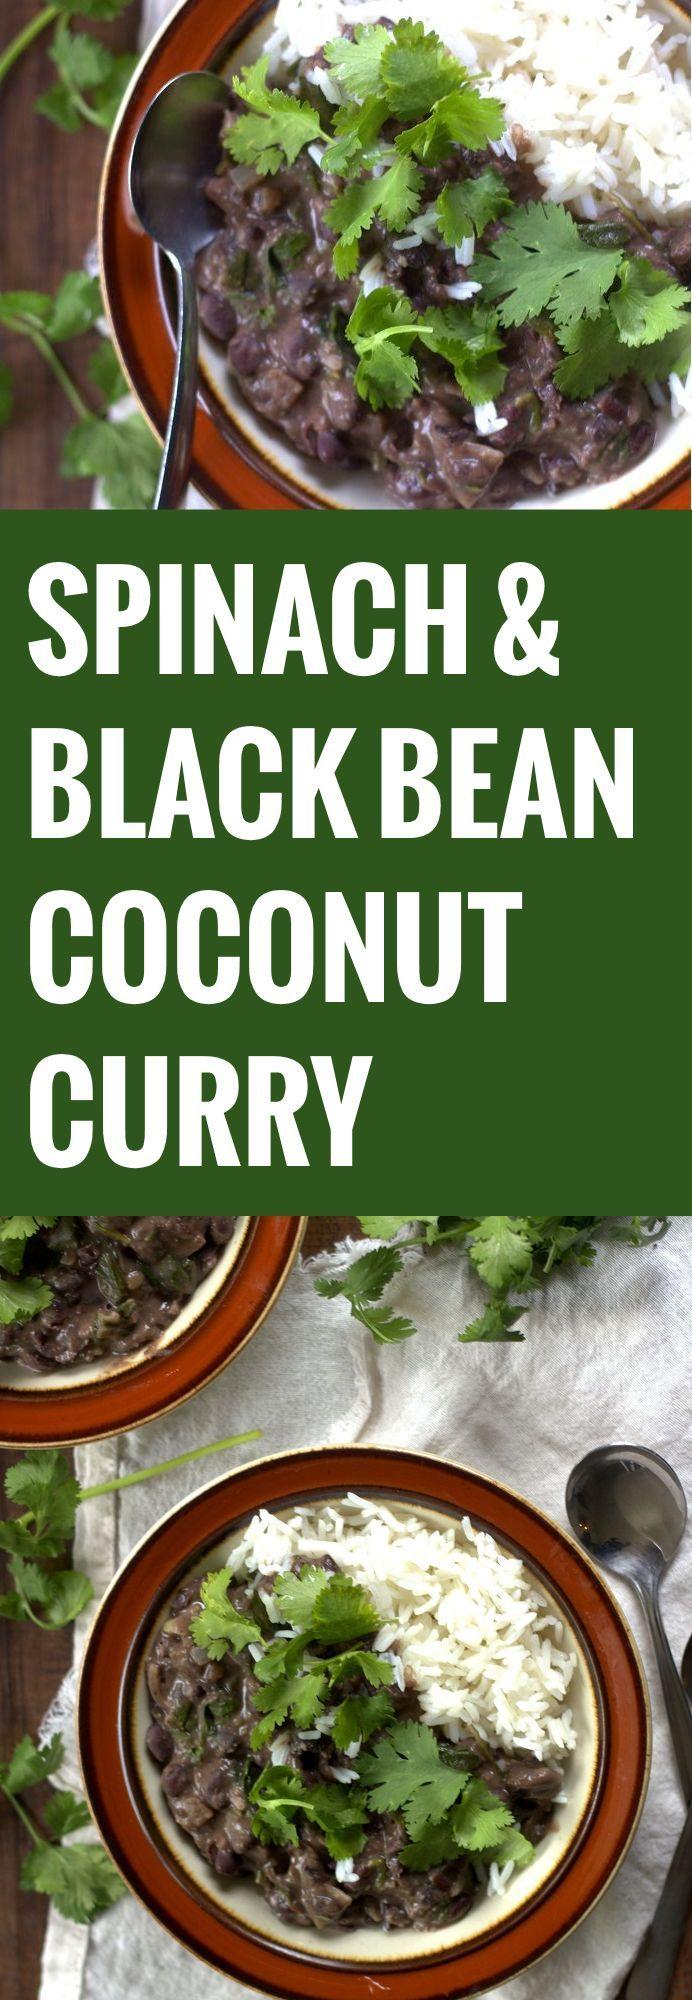 Spinach, Coconut and Black Bean Curry // olive oil, onion, garlic,  fresh ginger, black beans, lime juice, tinned coconut milk, vegetable stock, garam masala, ground coriander, ground cardamom, chili powder, fresh spinach, coriander, rice